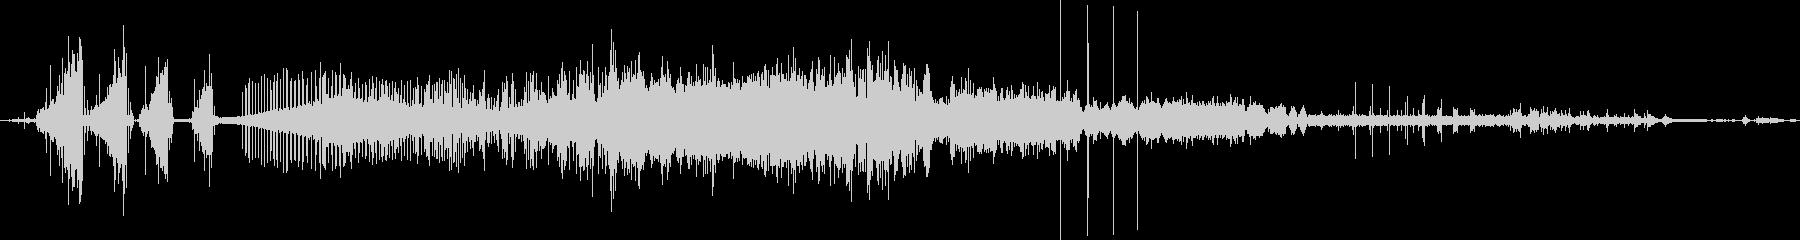 CINEMATIC BEEP 06の未再生の波形